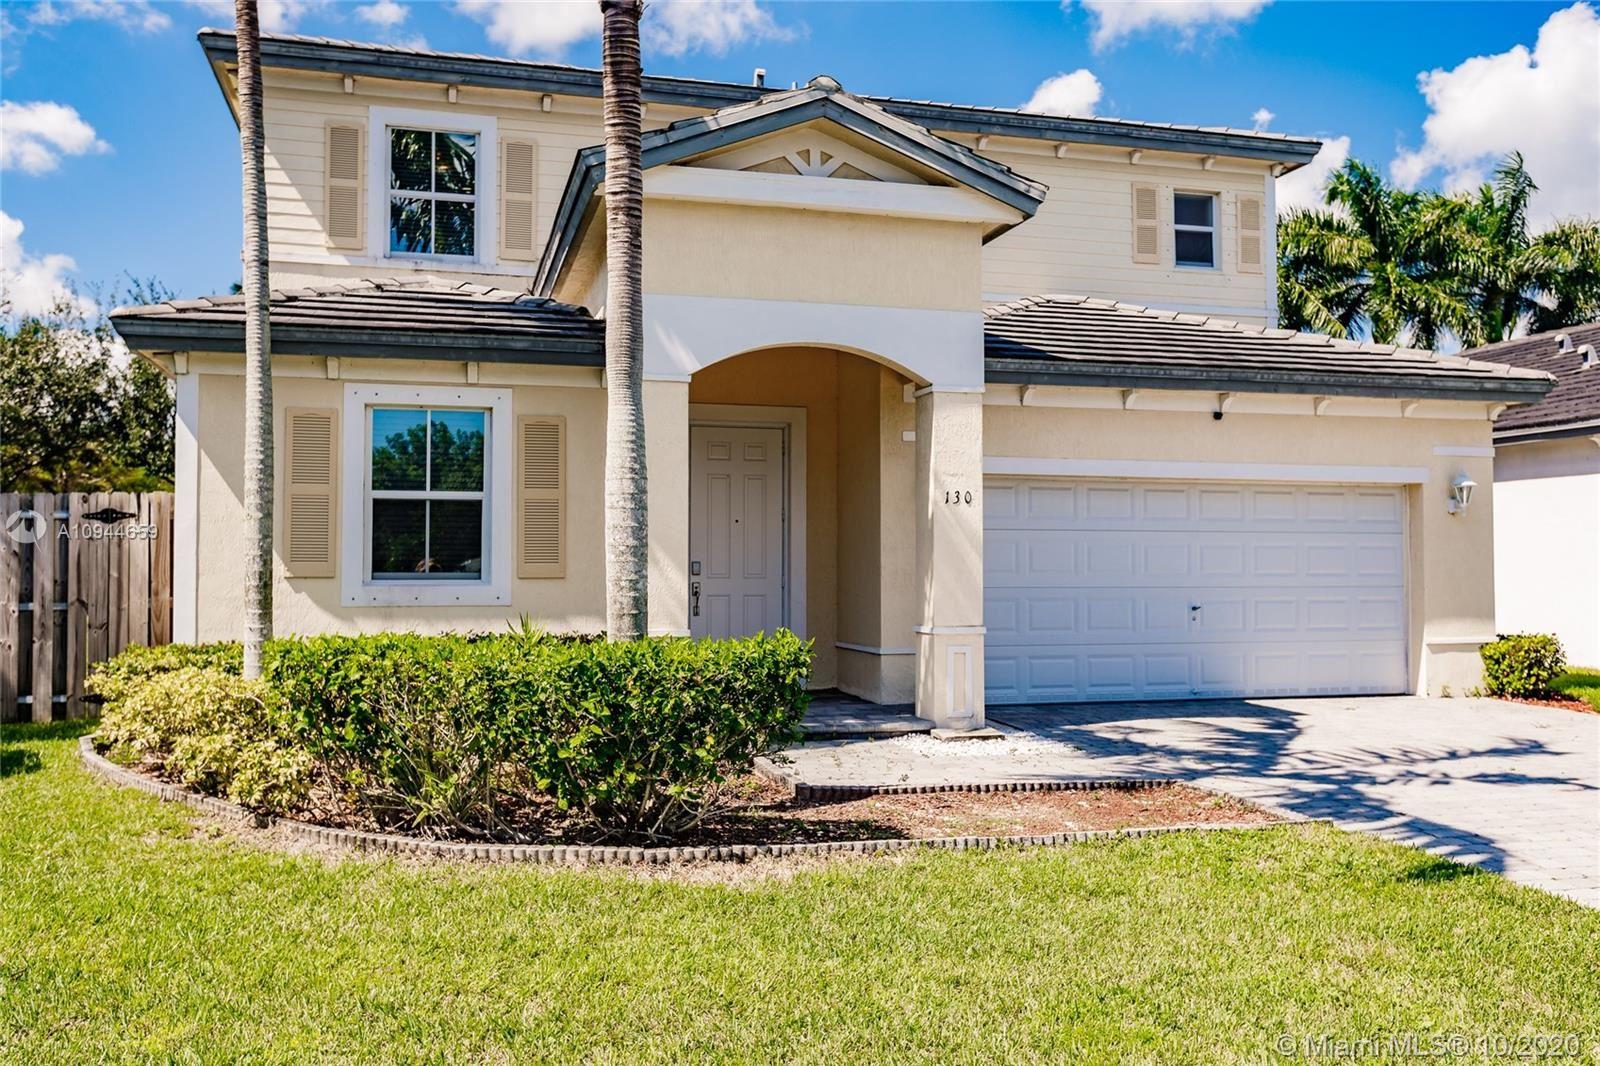 130 NE 28th Ter, Homestead, FL 33033 - #: A10944659